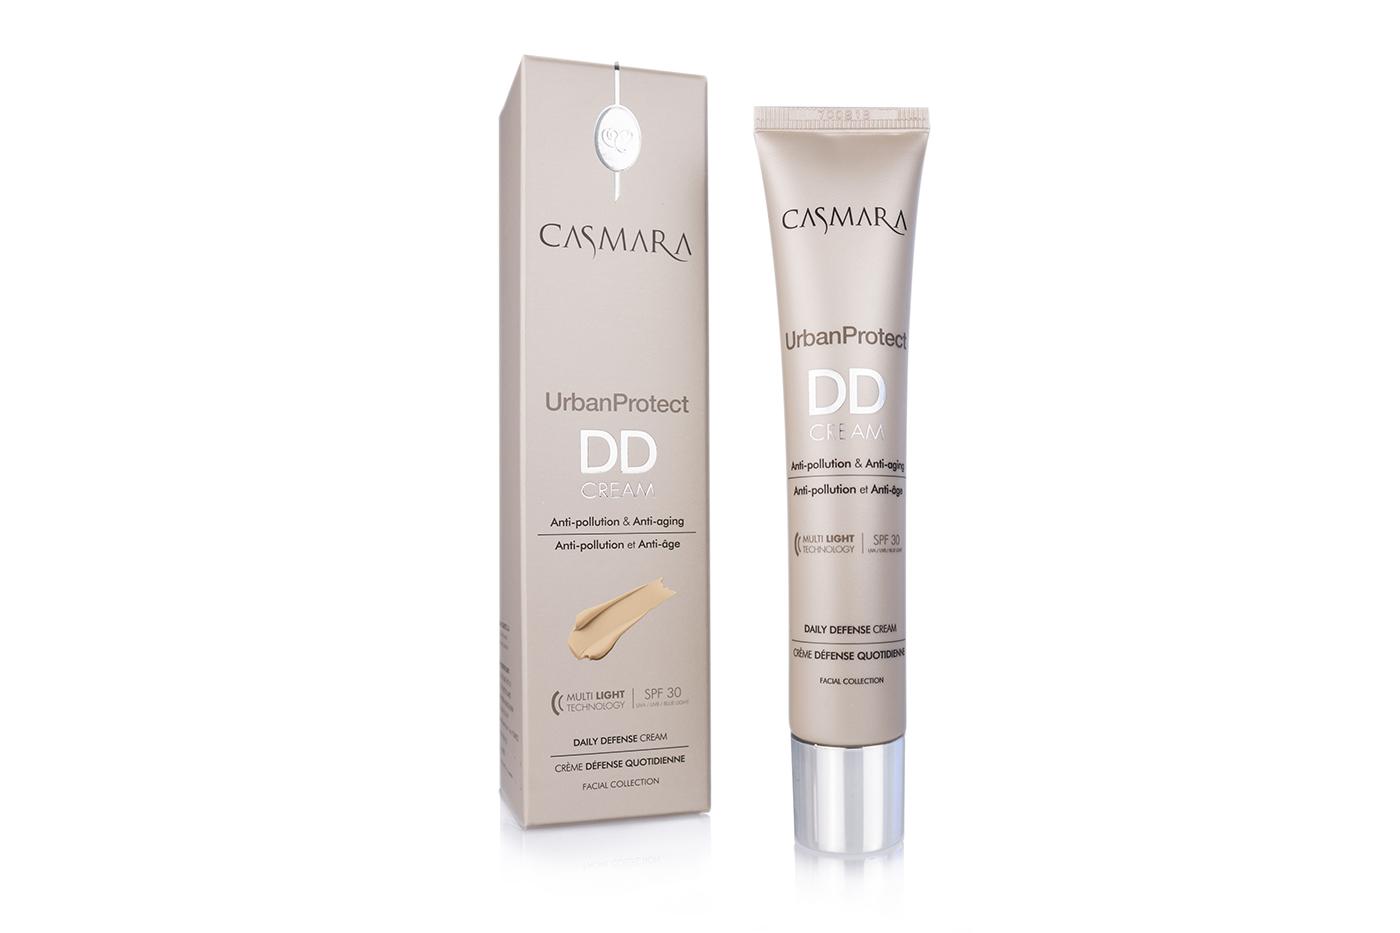 Casmara's DD cream for skin protection